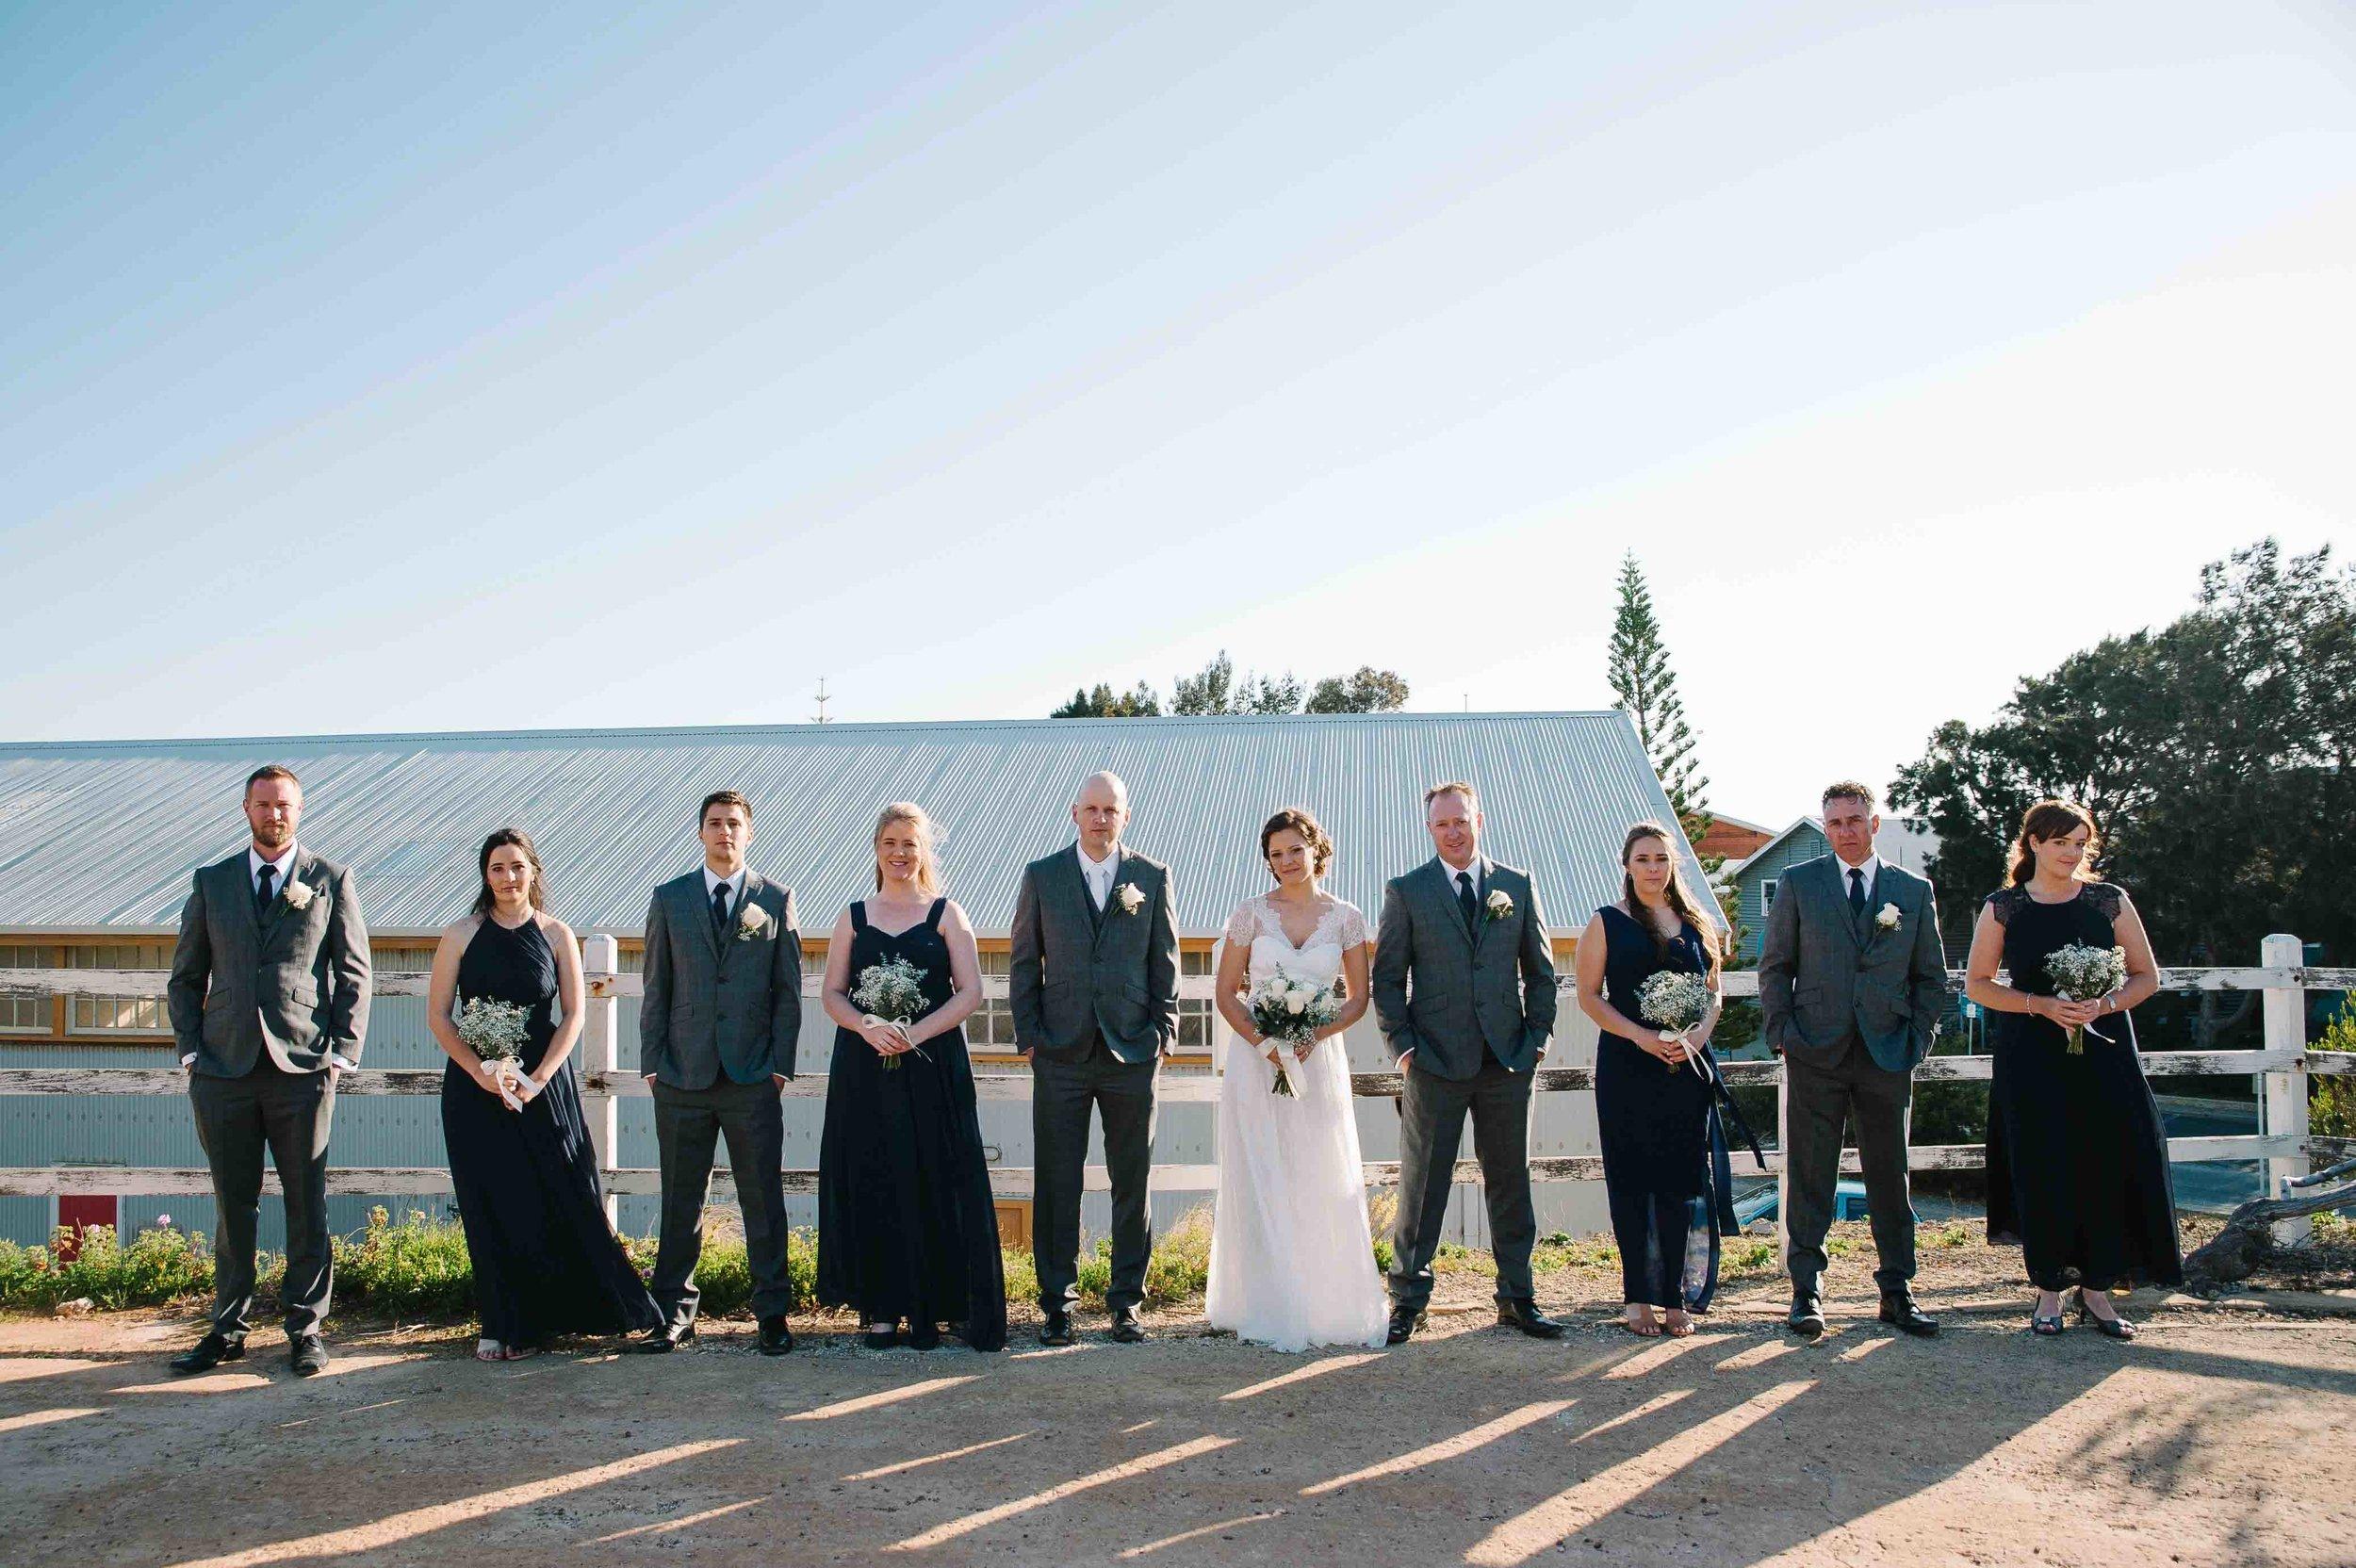 52-navy blue wedding dress.jpg